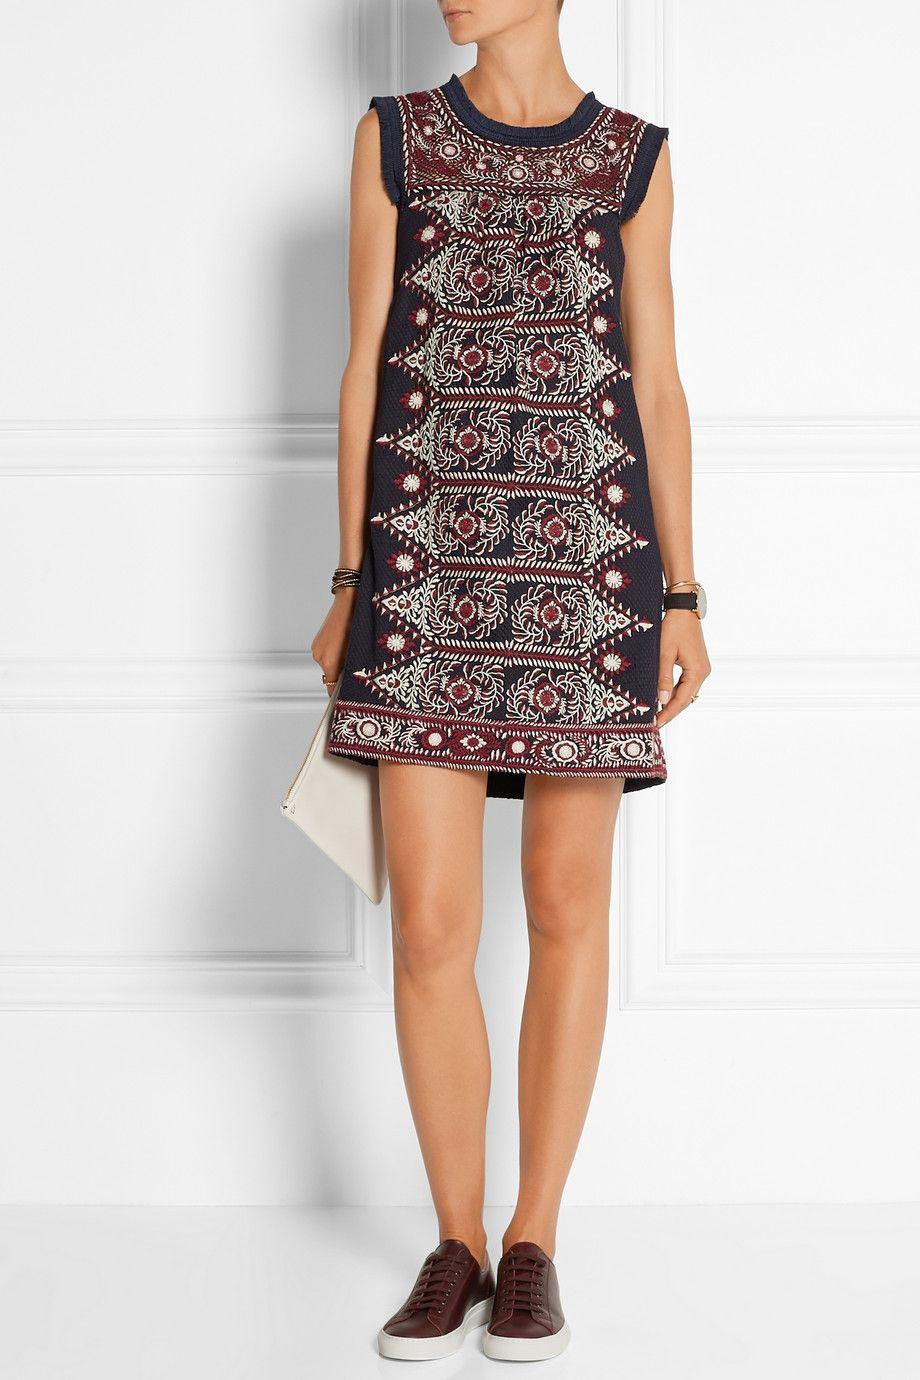 SEA | Embroidered woven cotton mini dress | NET-A-PORTER.COM